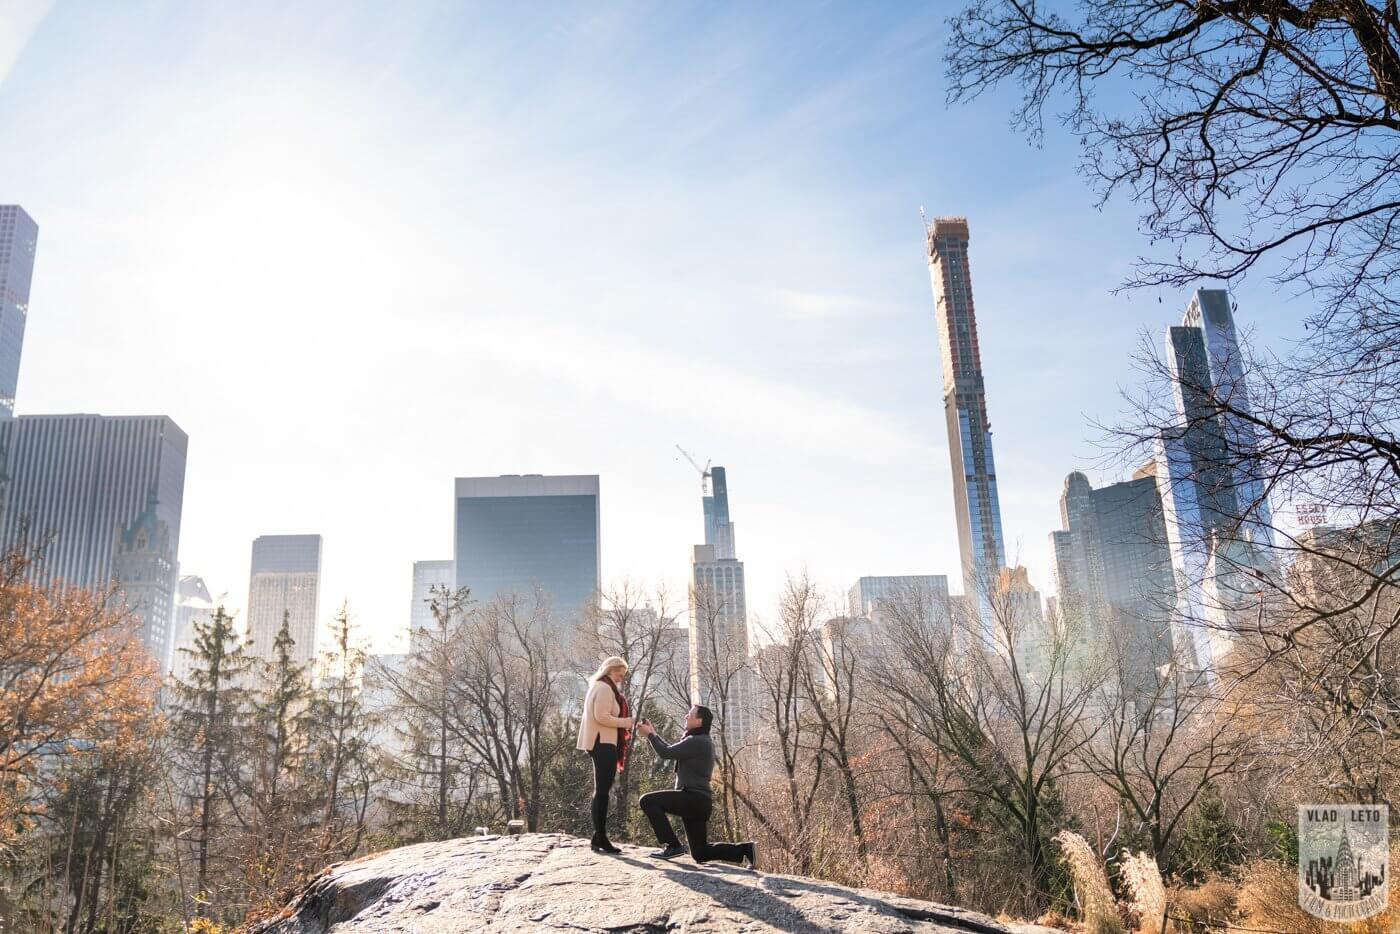 Photo Central Park Wedding proposal | VladLeto